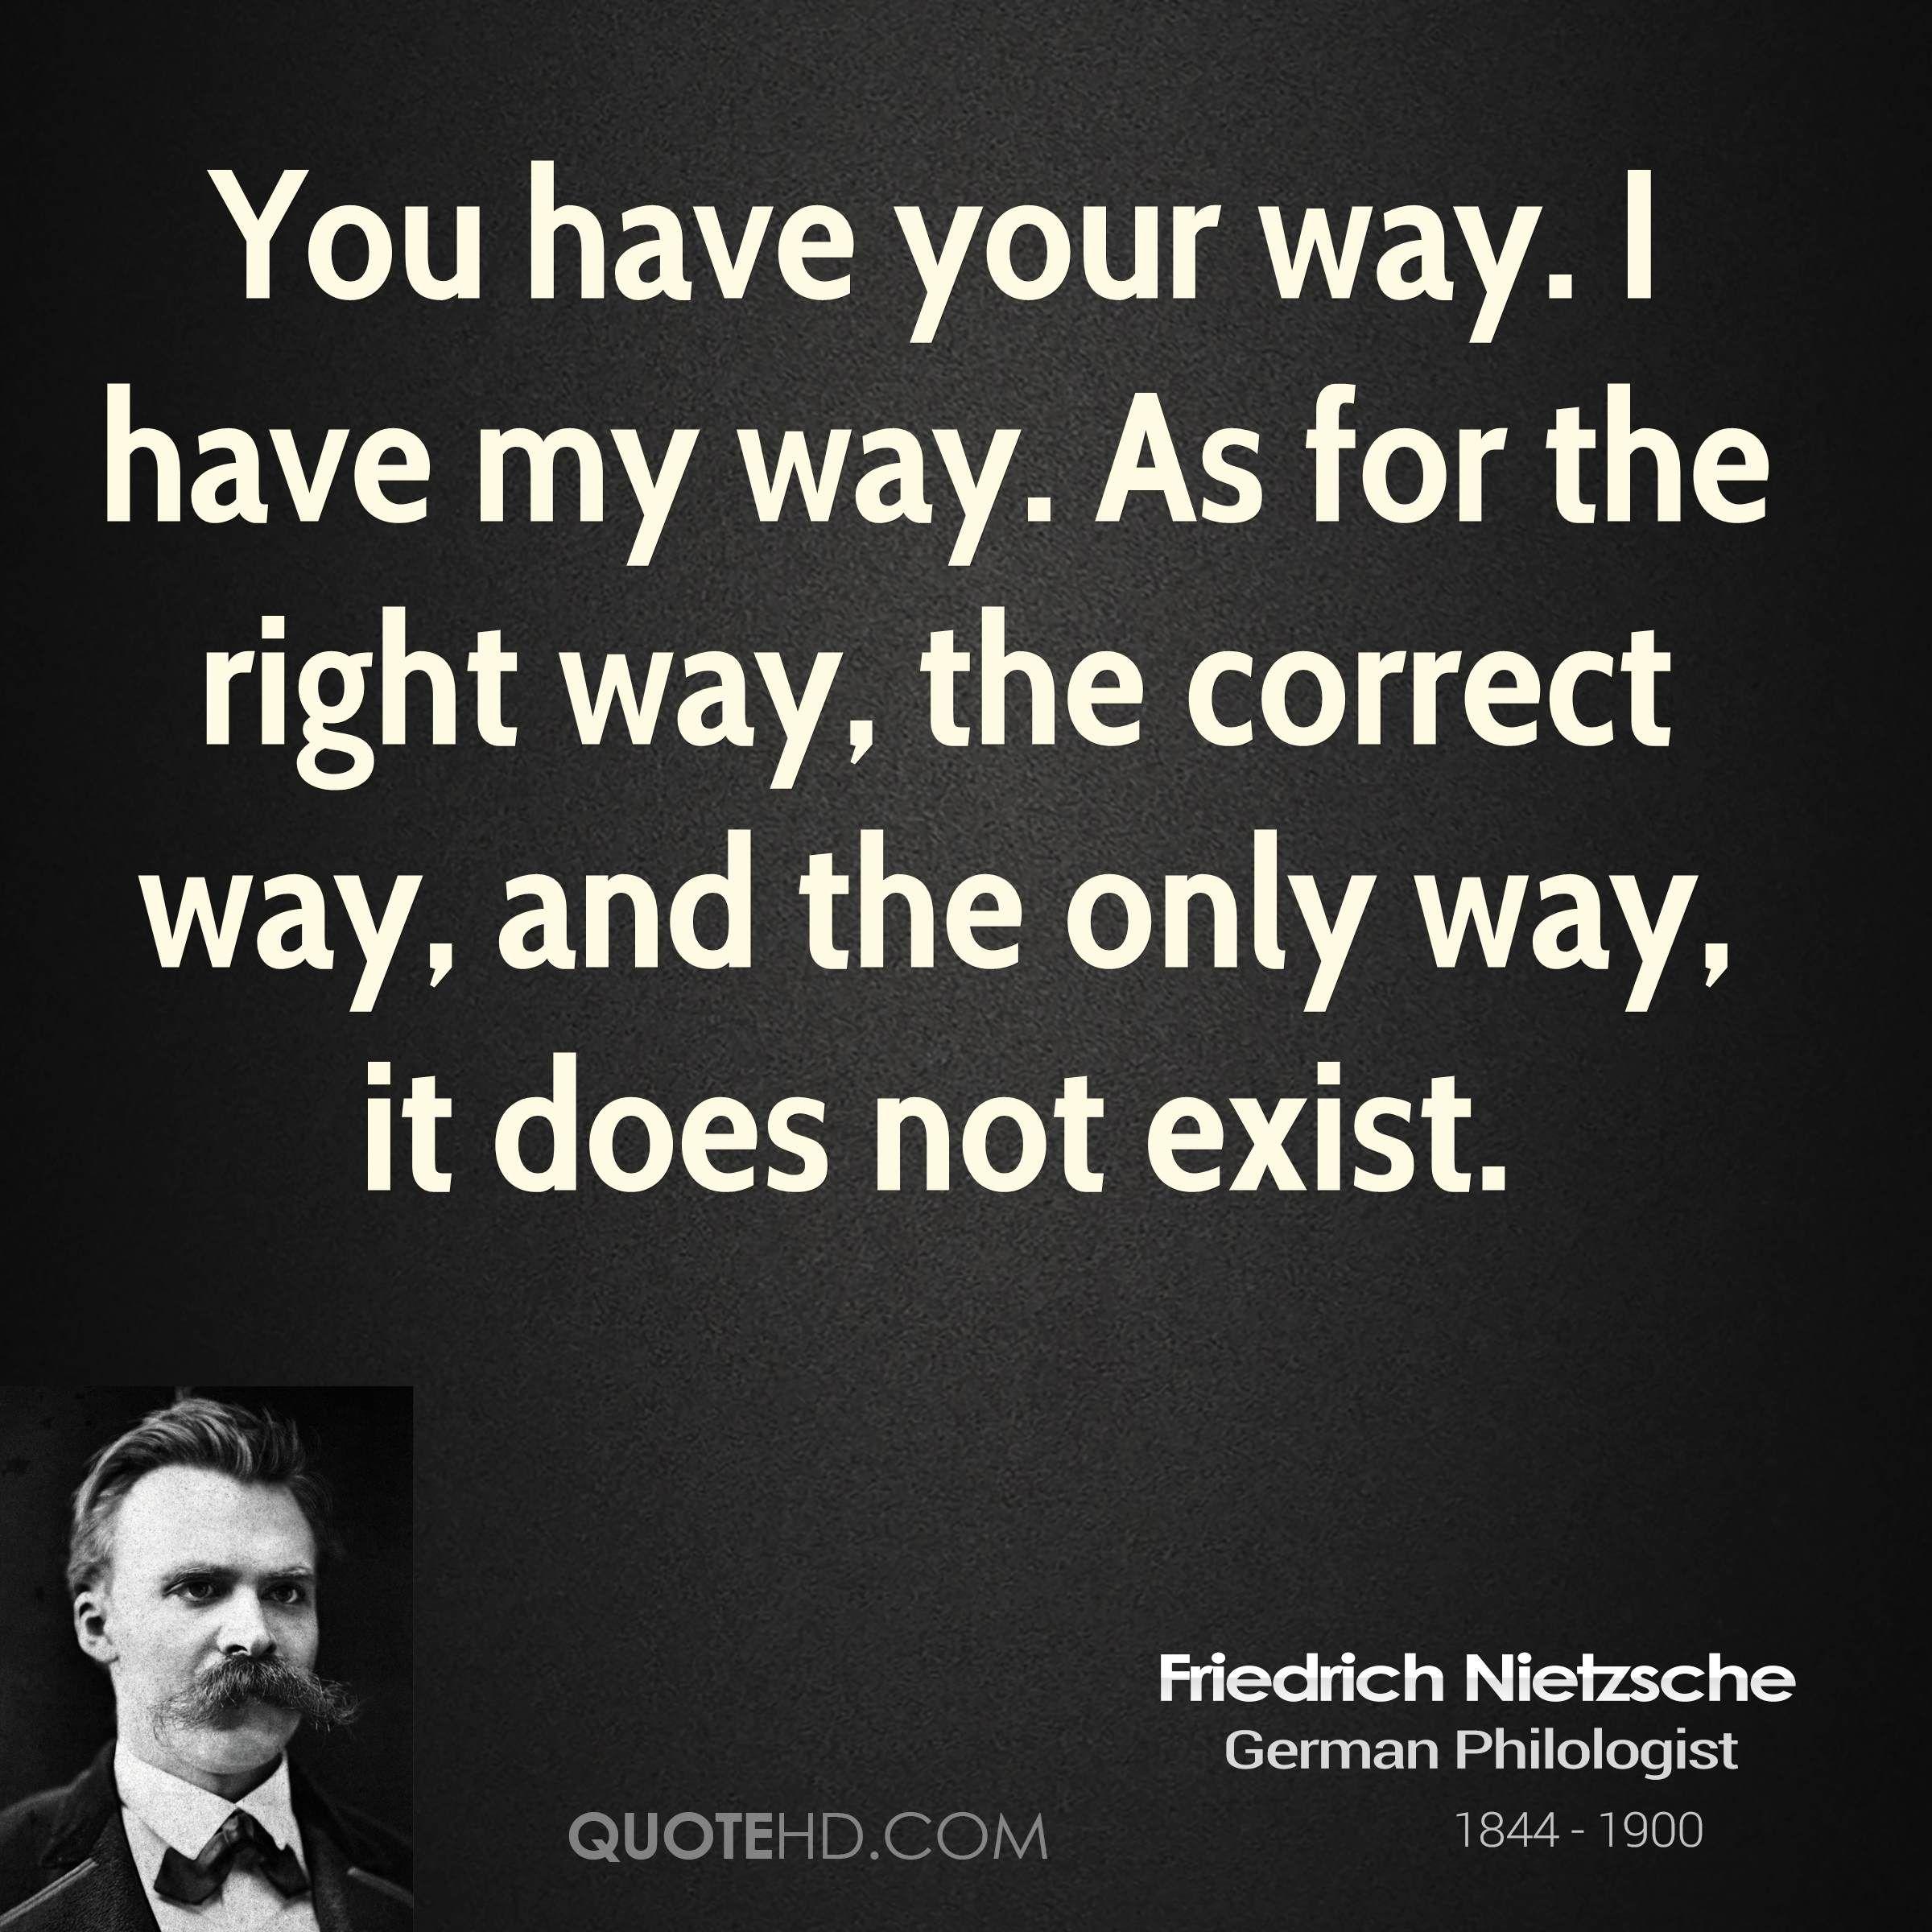 Life Philosophy Quotes Famous: Friedrich Nietzsche Quotes The Way